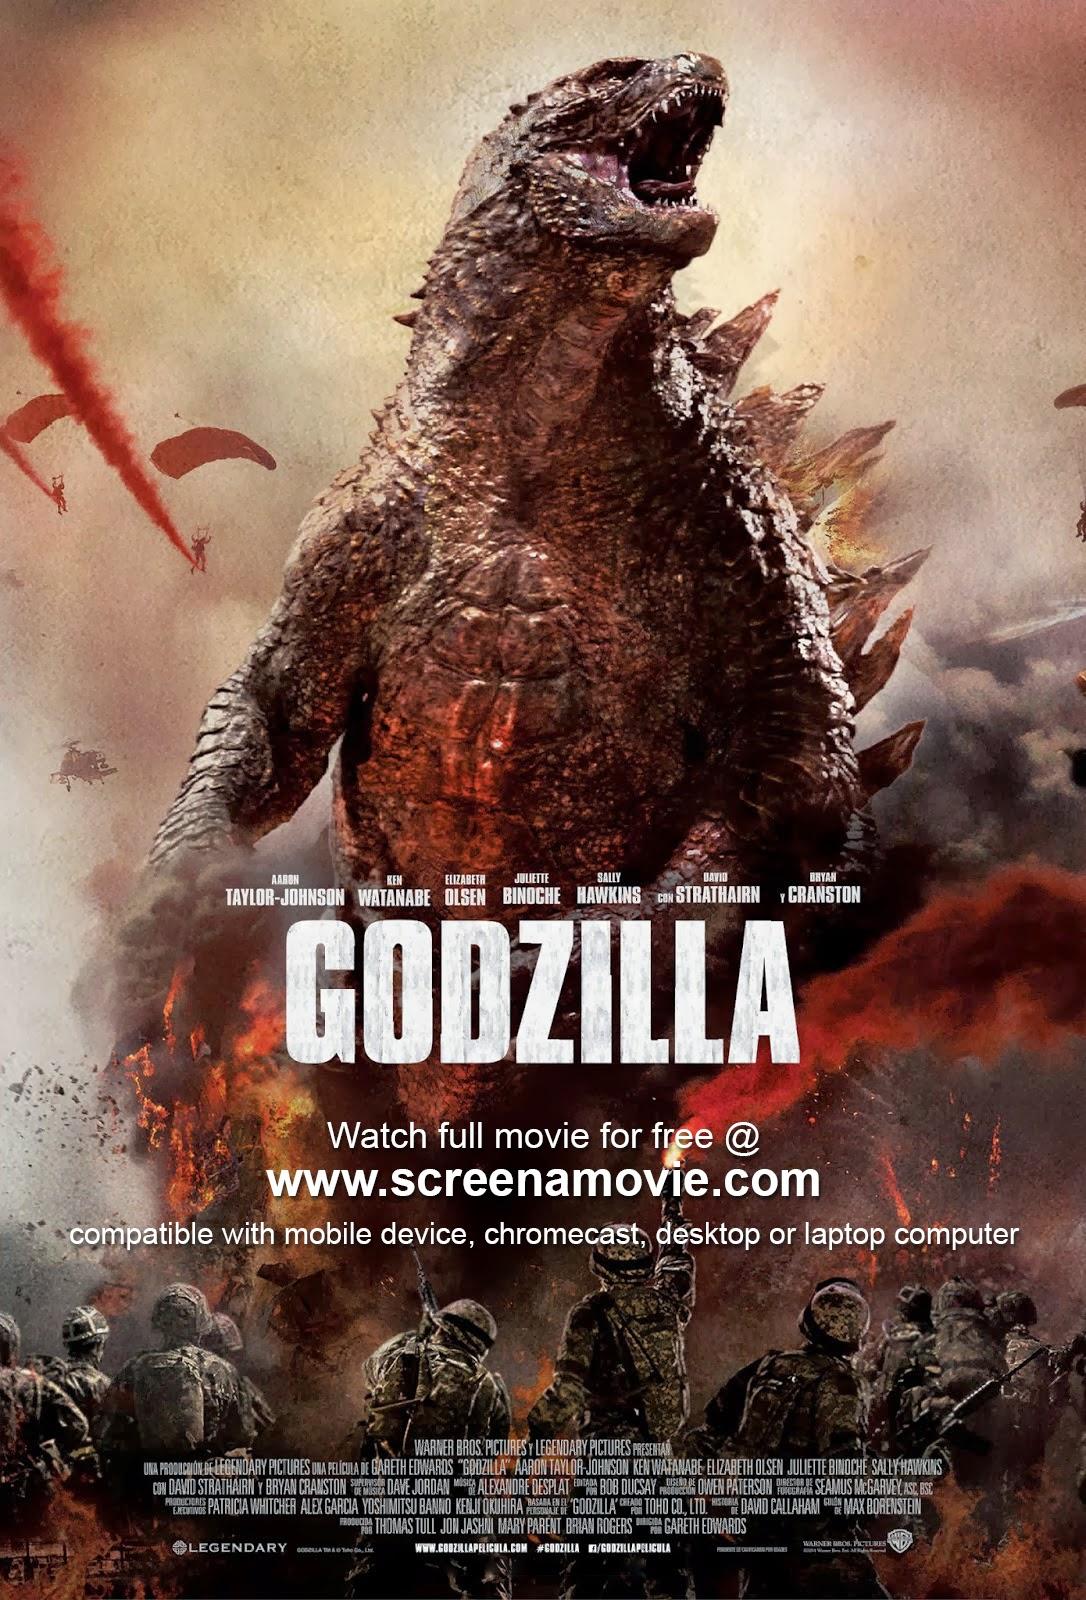 Godzilla_2014_@screenamovie